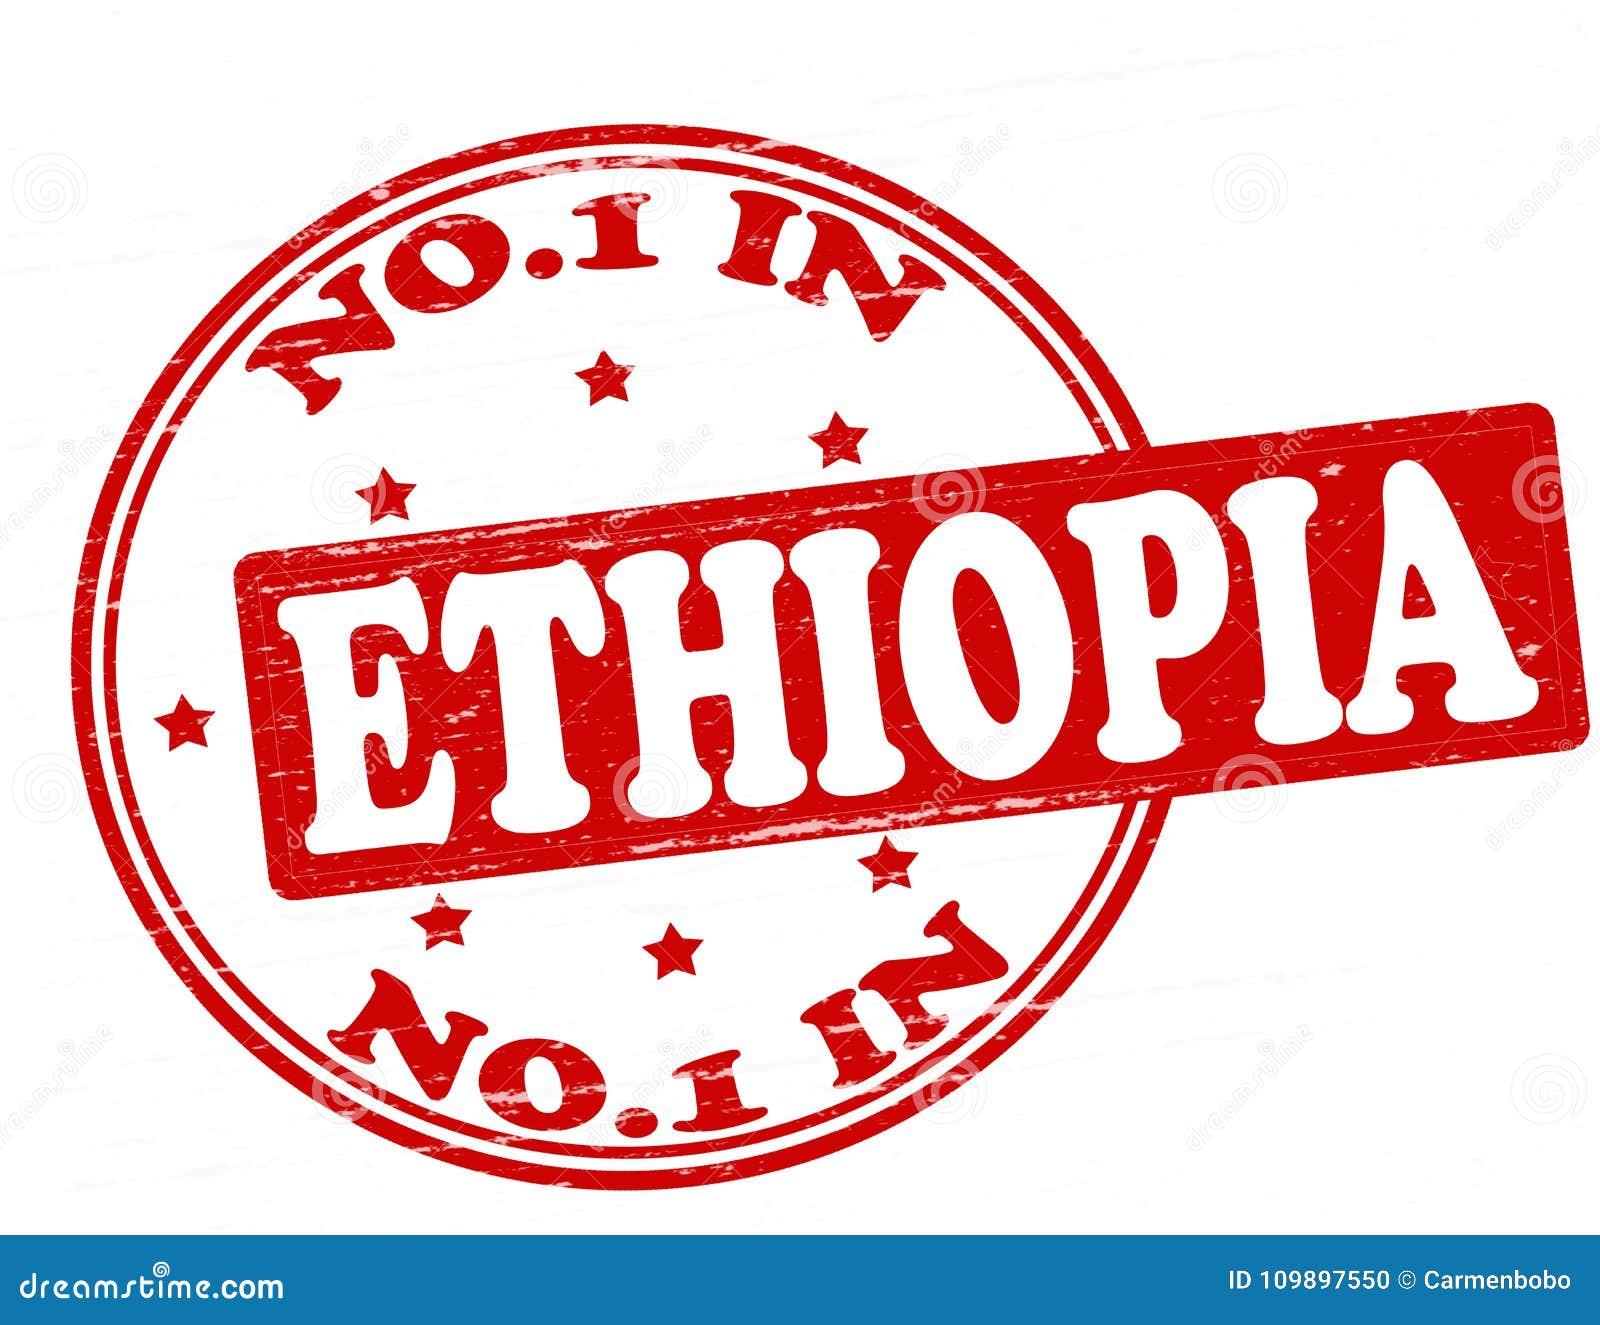 Ninguém em Etiópia